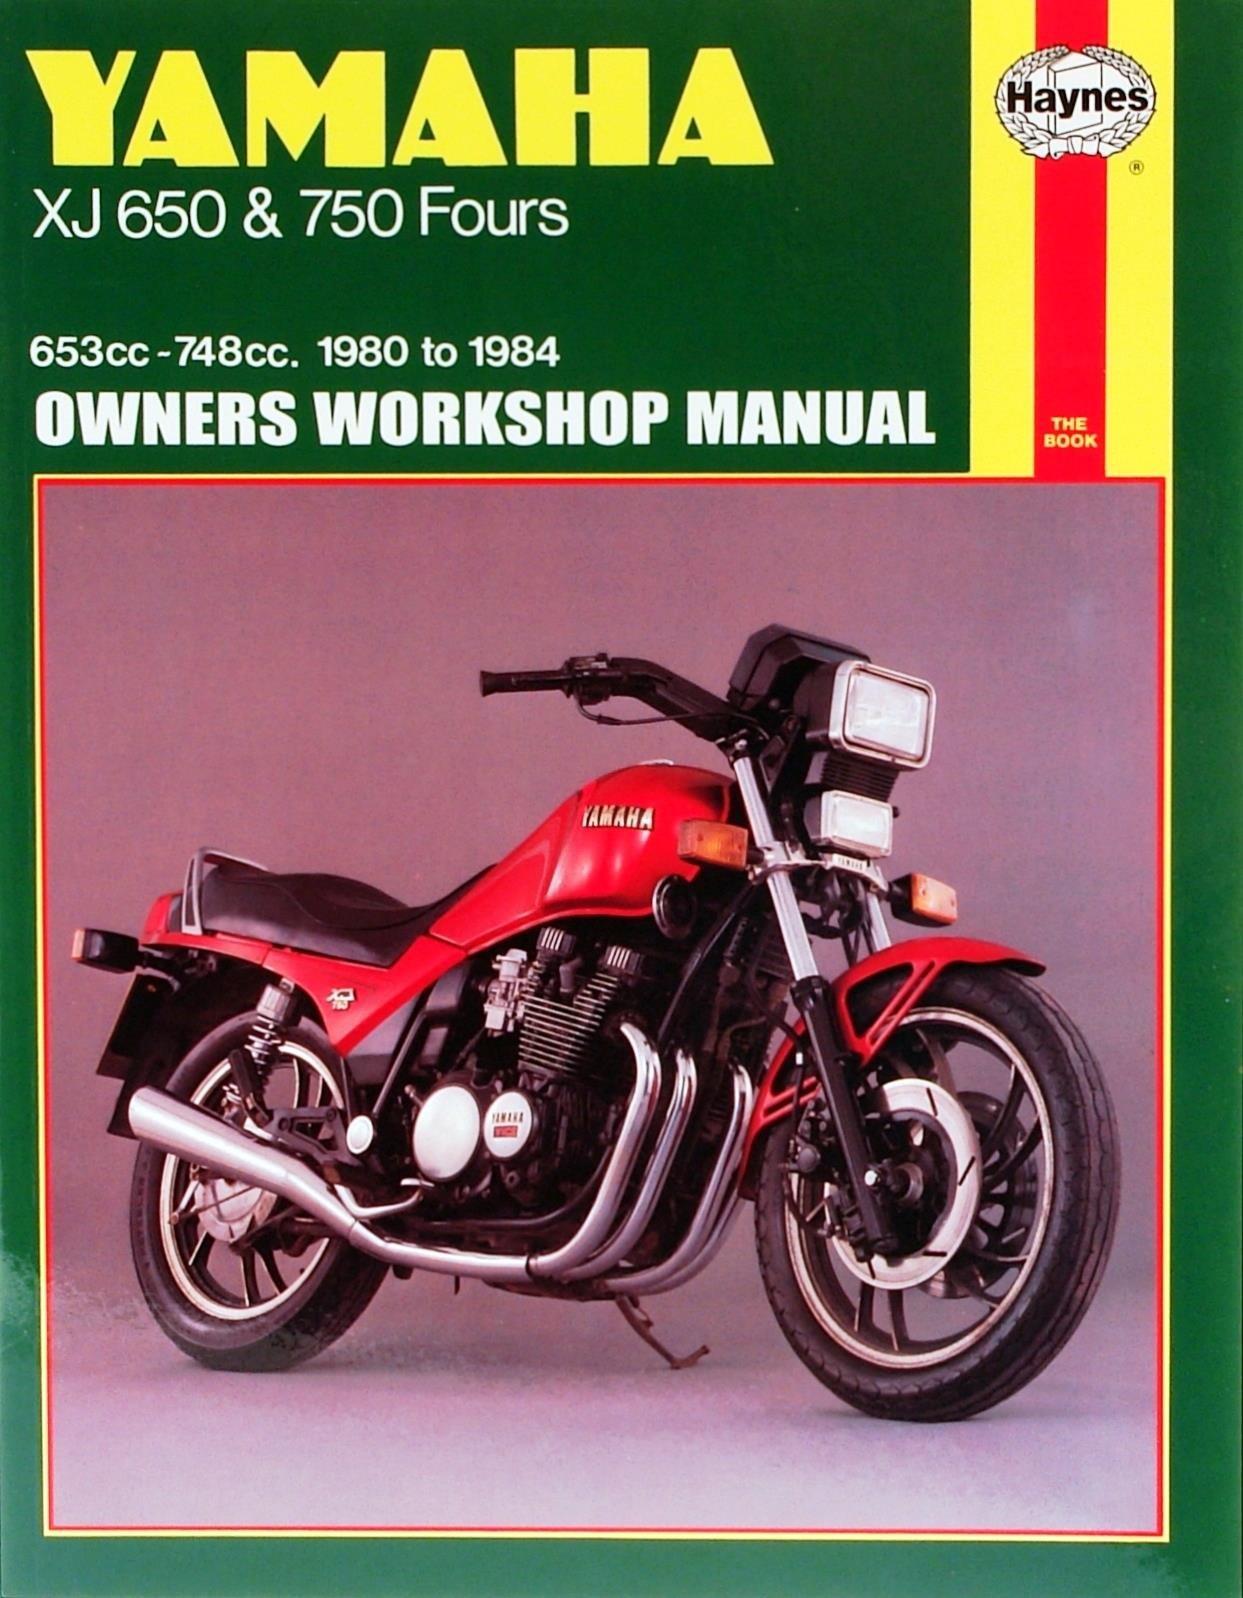 80-83 YAMAHA XJ650: Haynes Repair Manual: 0038345007385: Amazon.com: Books